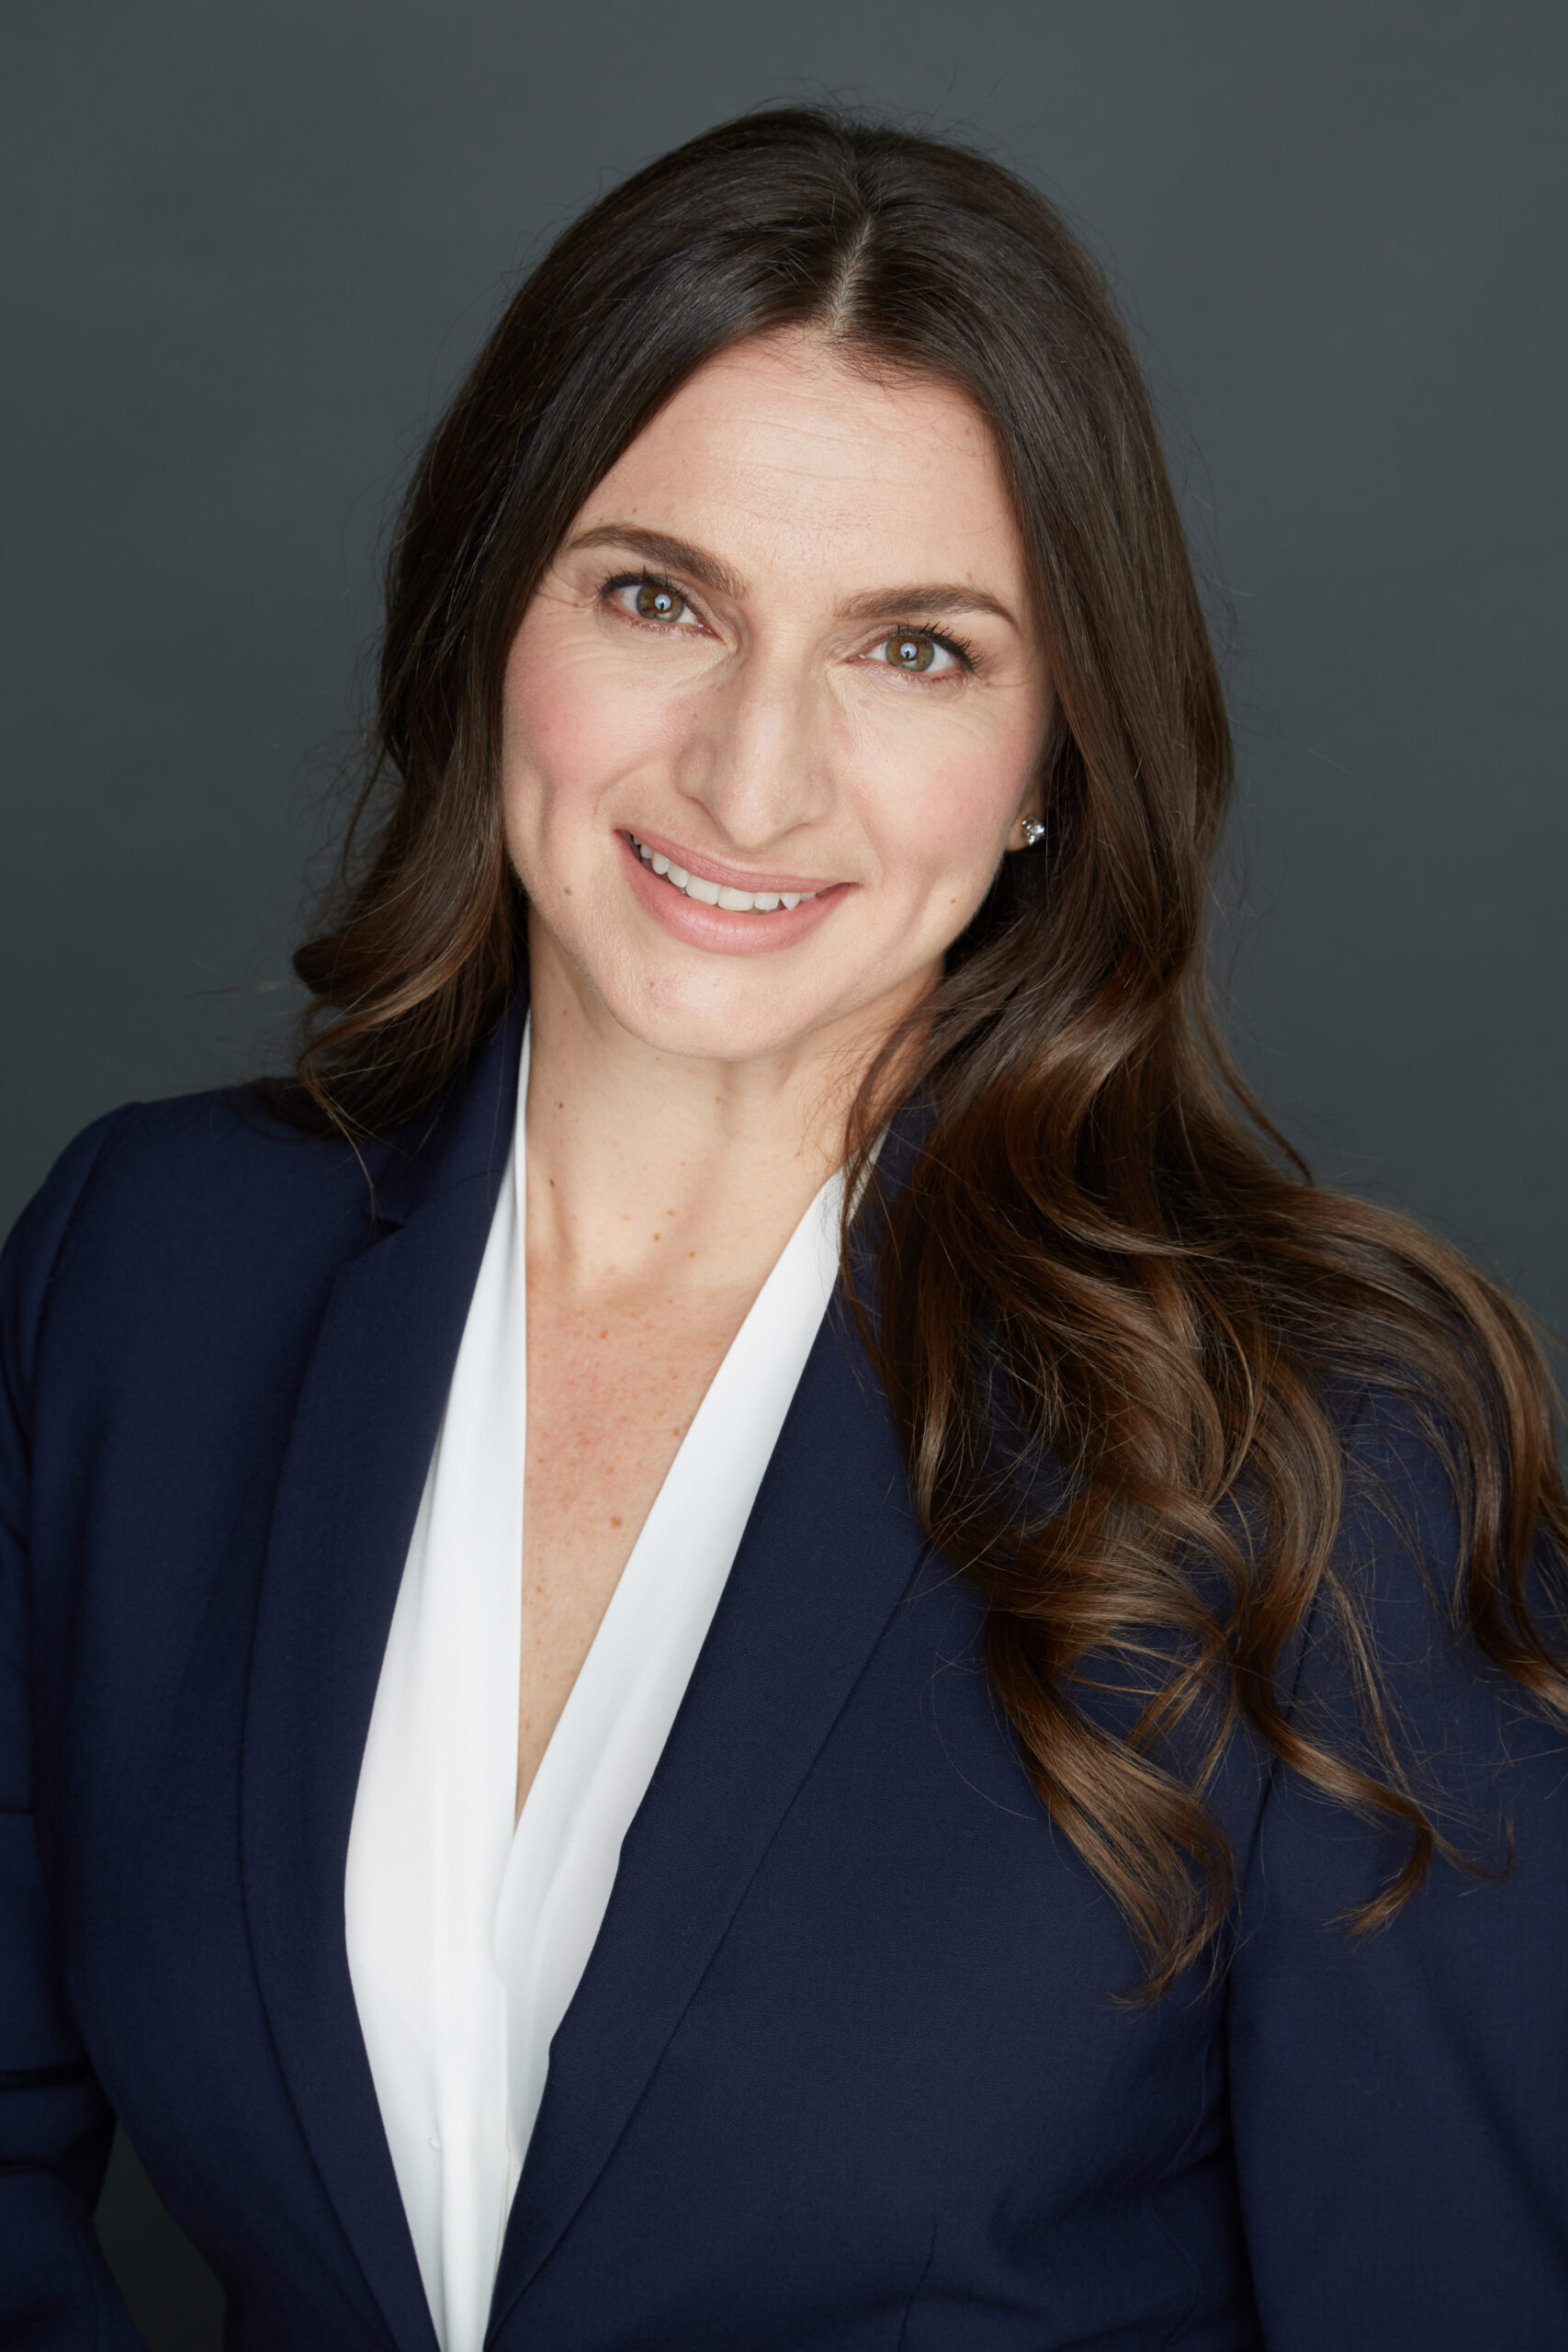 Irena Bozdogan CEO and FOunder of Health Genesis Corporation